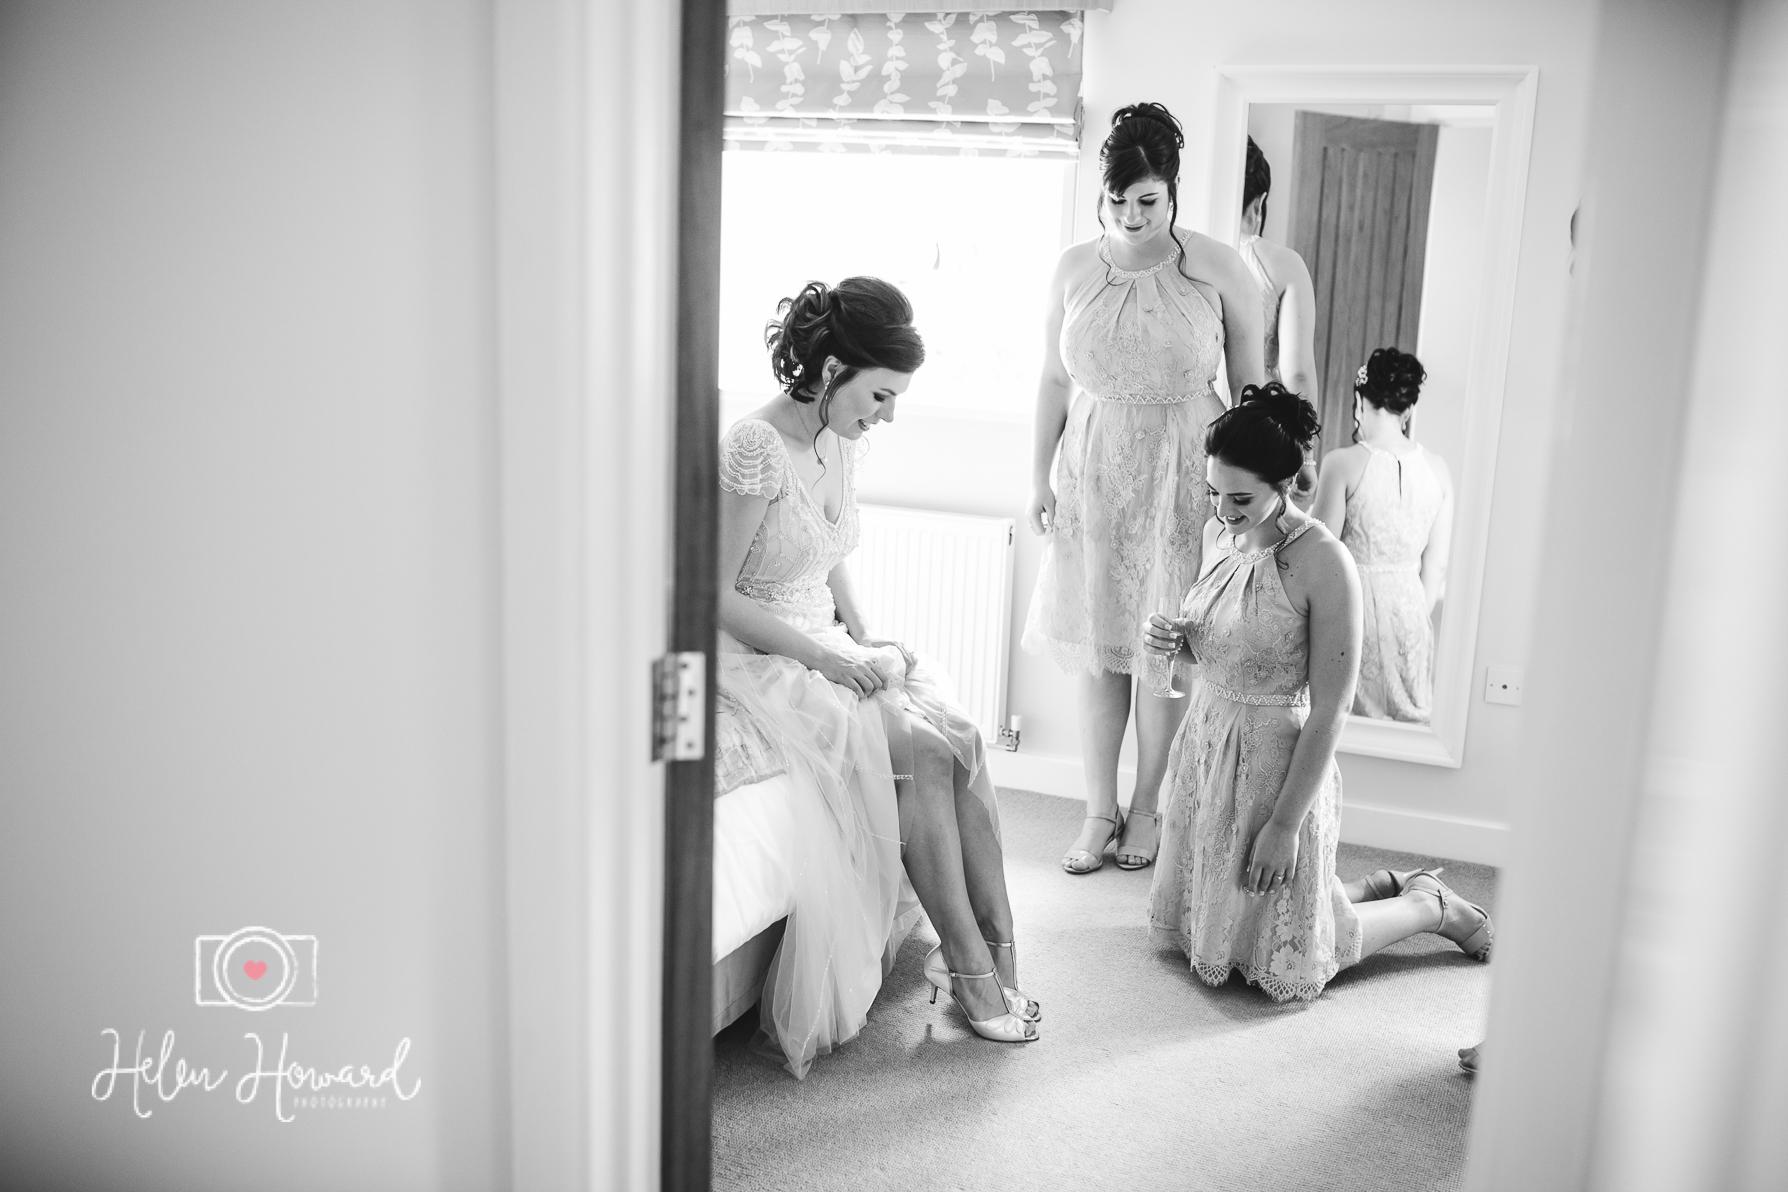 Helen Howard Photography Packington Moor Wedding-43.jpg